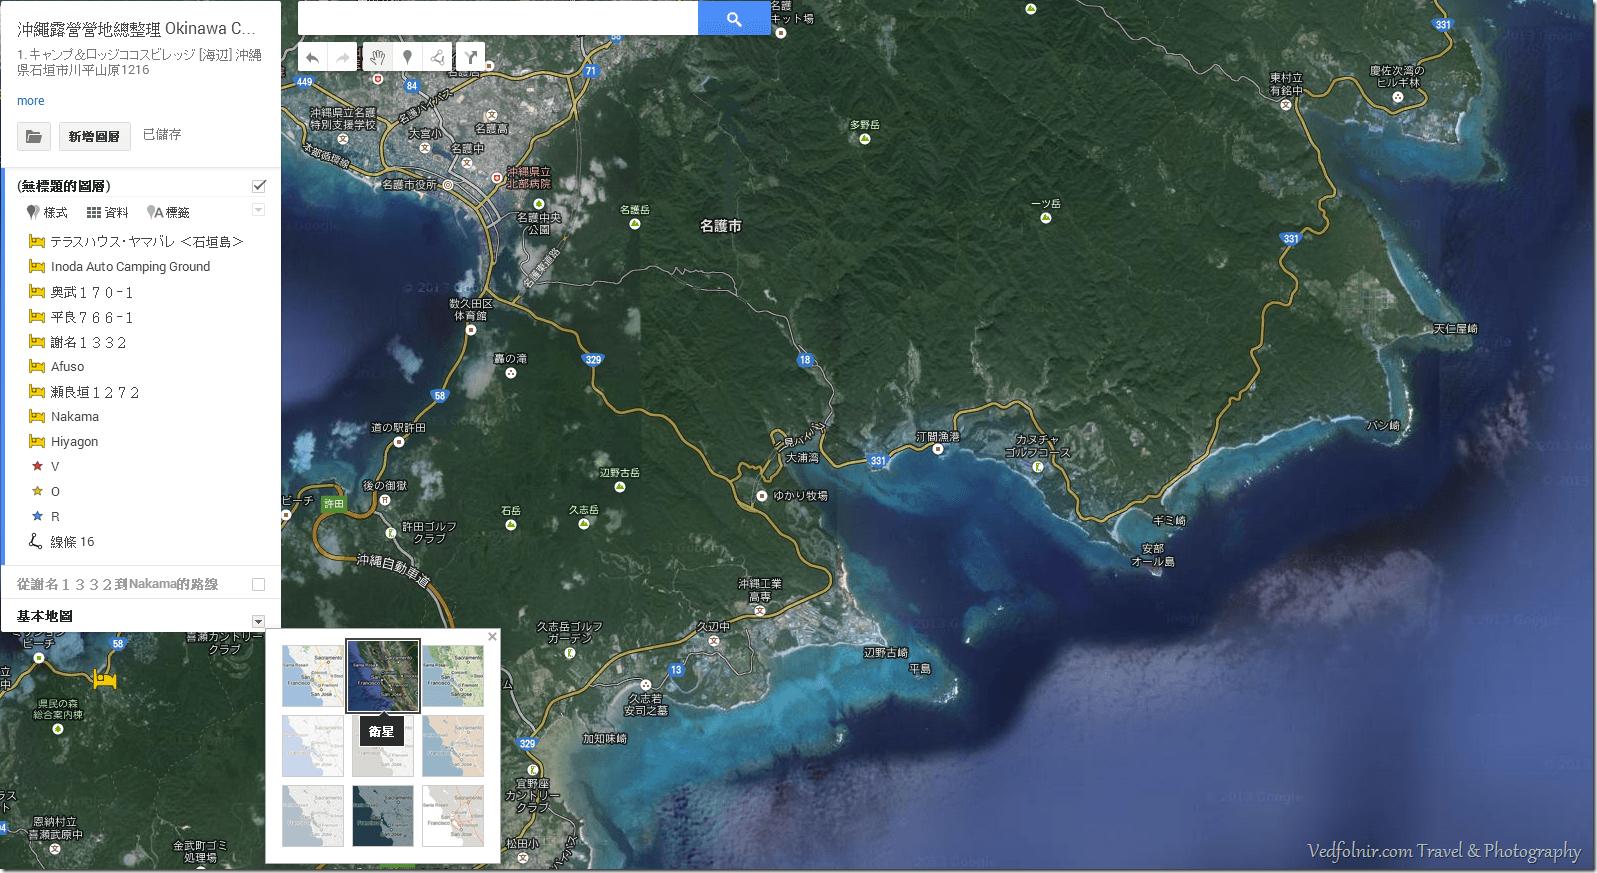 Google Maps Engine 建立和分享自訂地圖 基本地圖採用衛星地圖類型的呈現